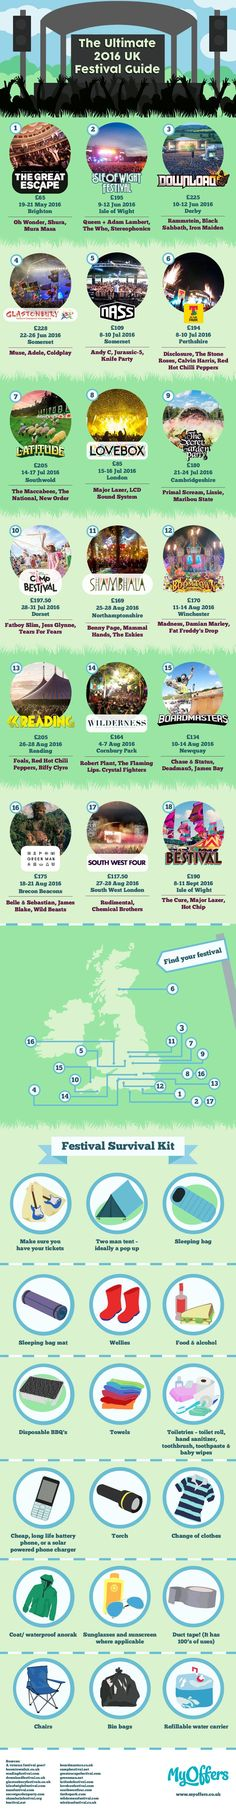 The Ultimate 2016 UK Festival Guide #Infographic #Festival #Music #UK